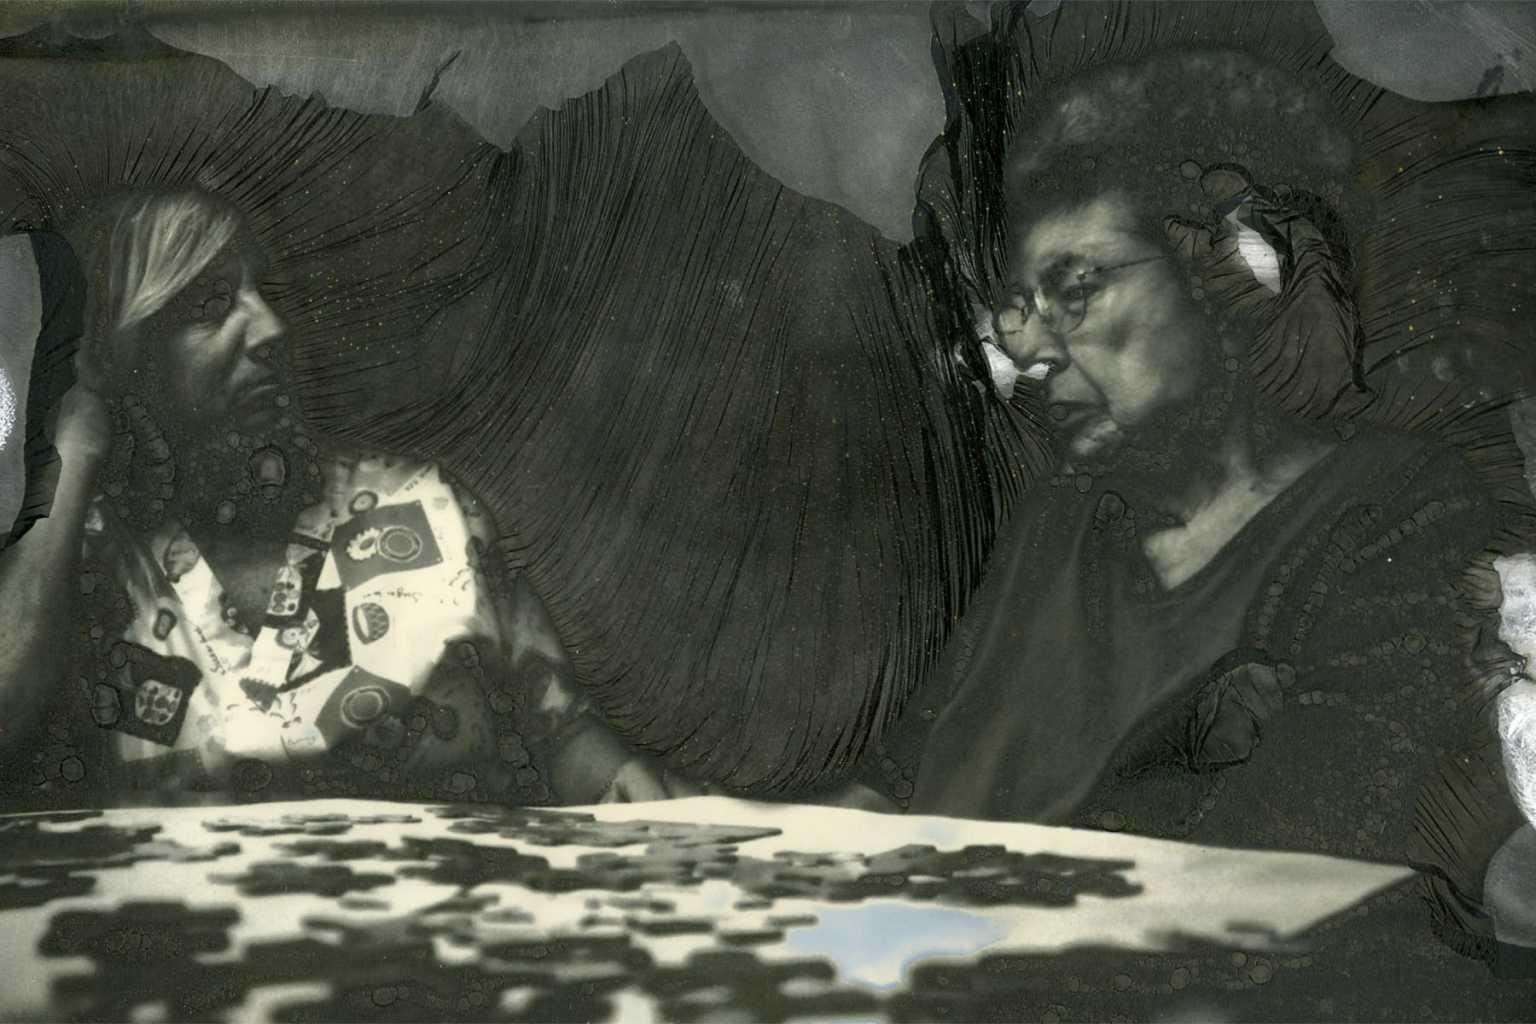 Alternative Photographic Processes Final Project